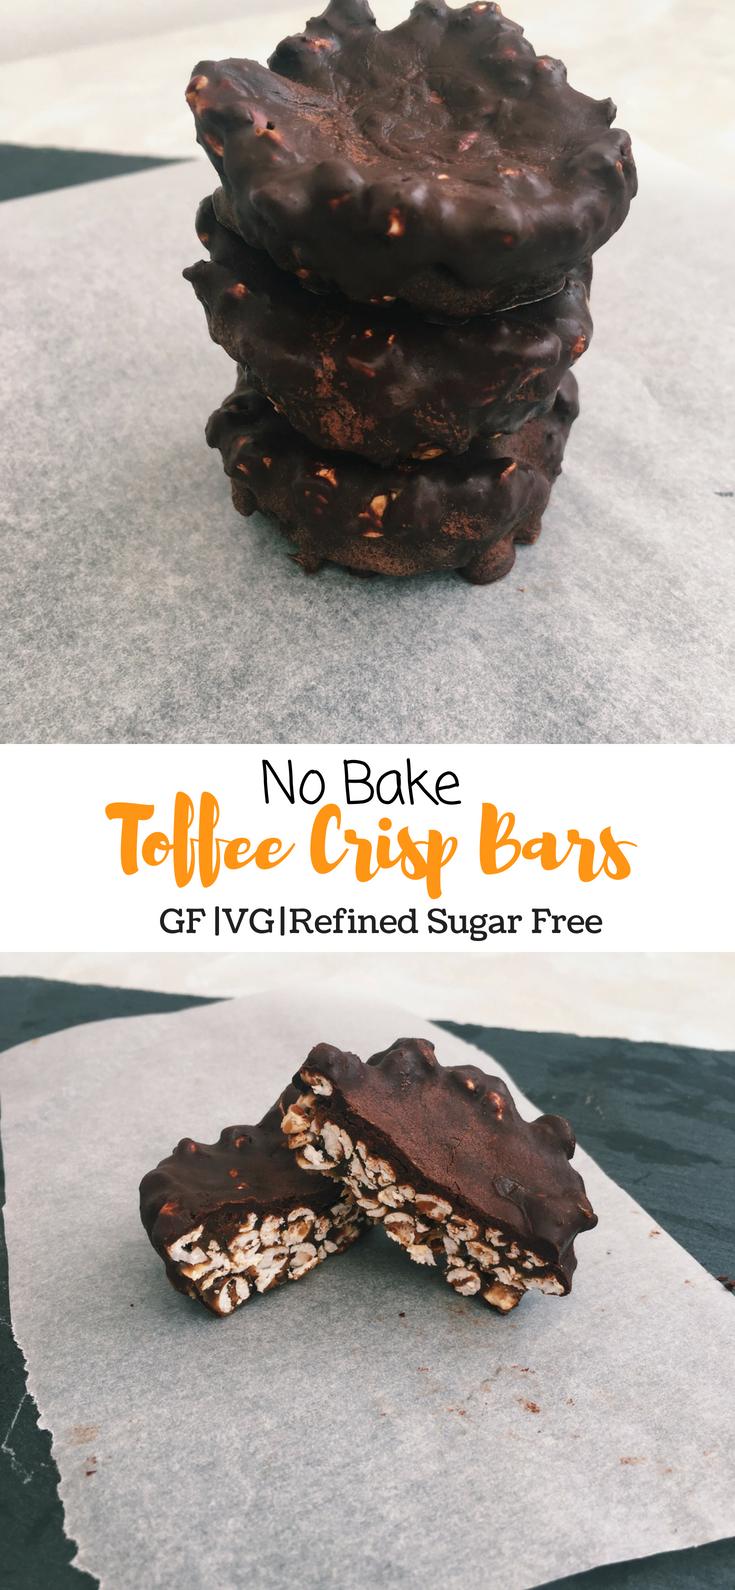 No Bake Toffee Crisp Bars (GF, VG, Refined Sugar Free)